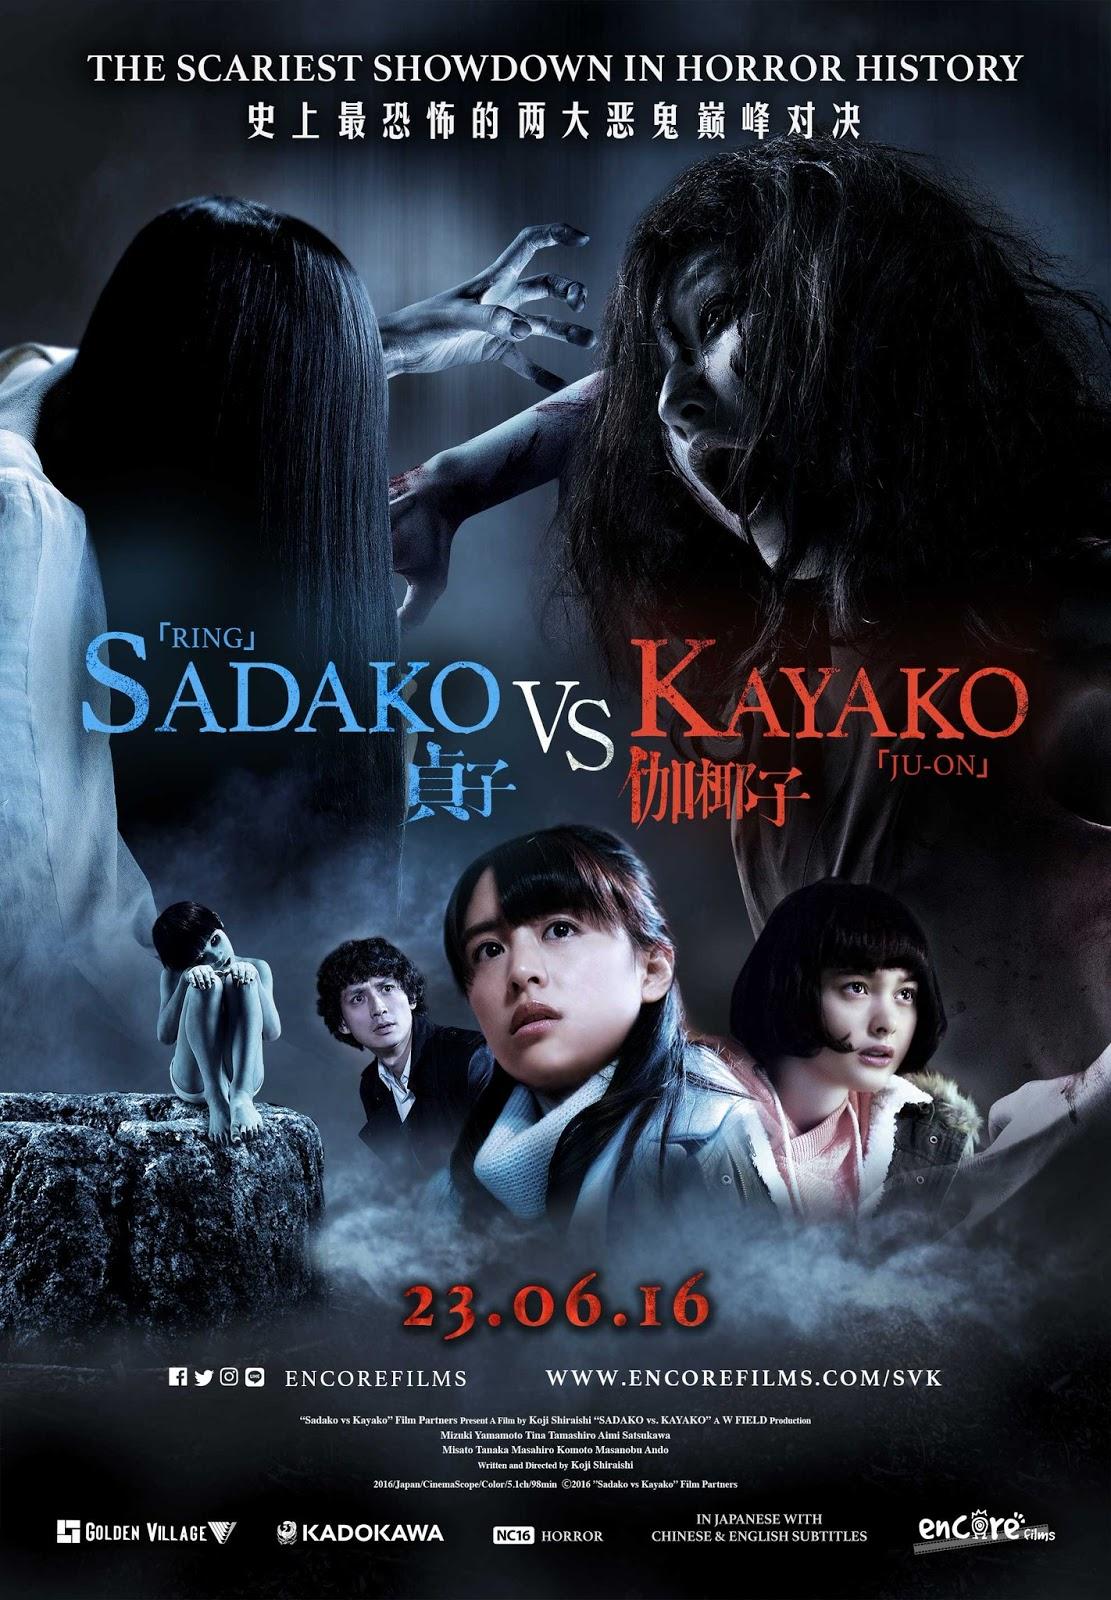 Sadako-vs-Kayako-MotelX